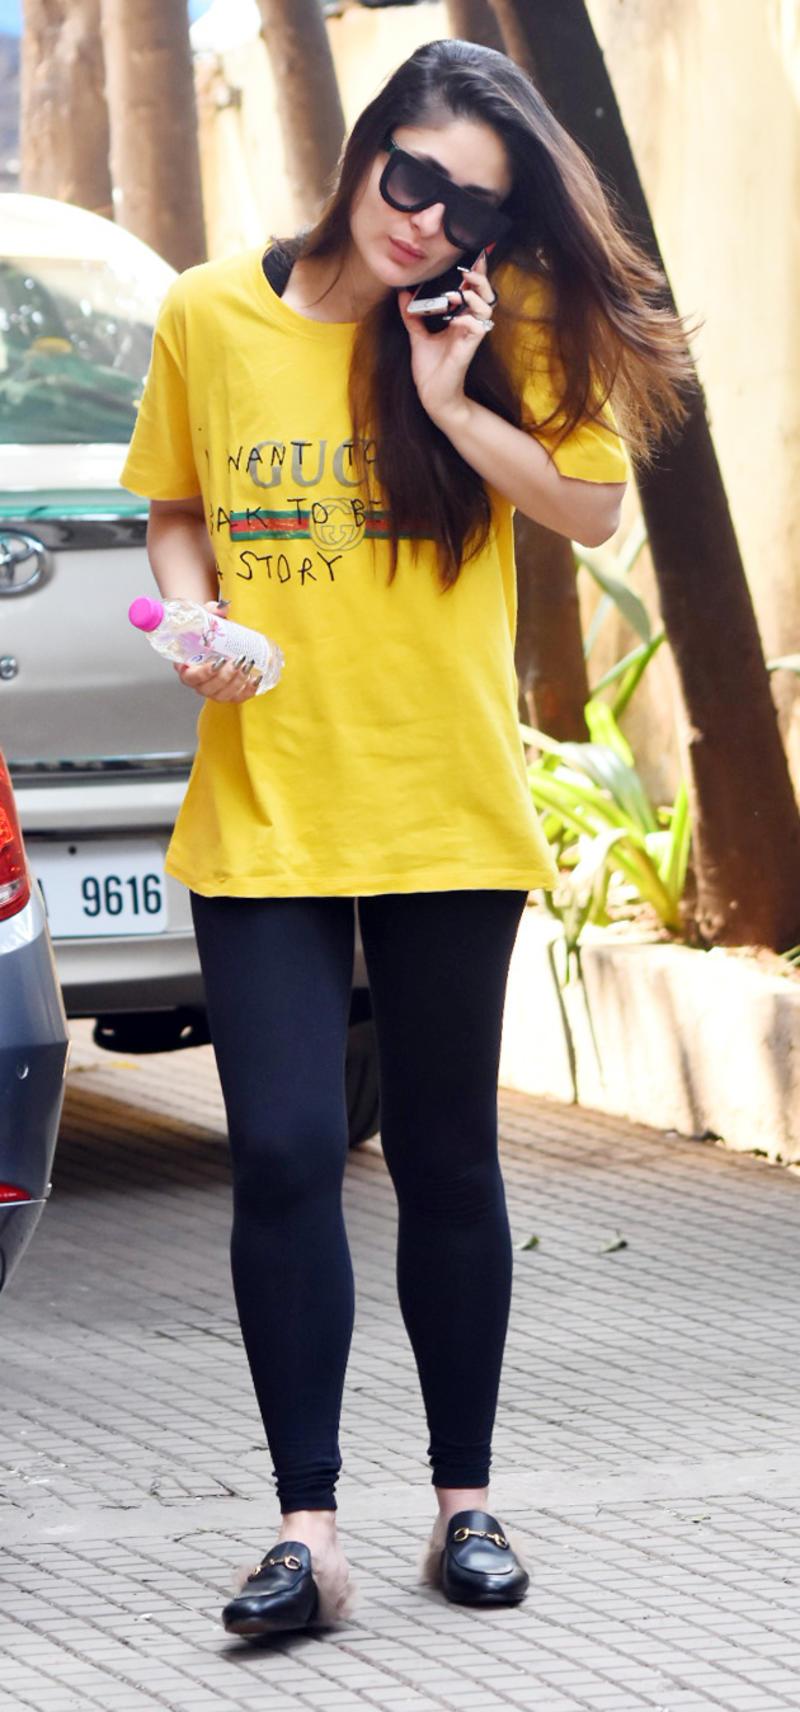 Kareena Kapoor at her fittest best